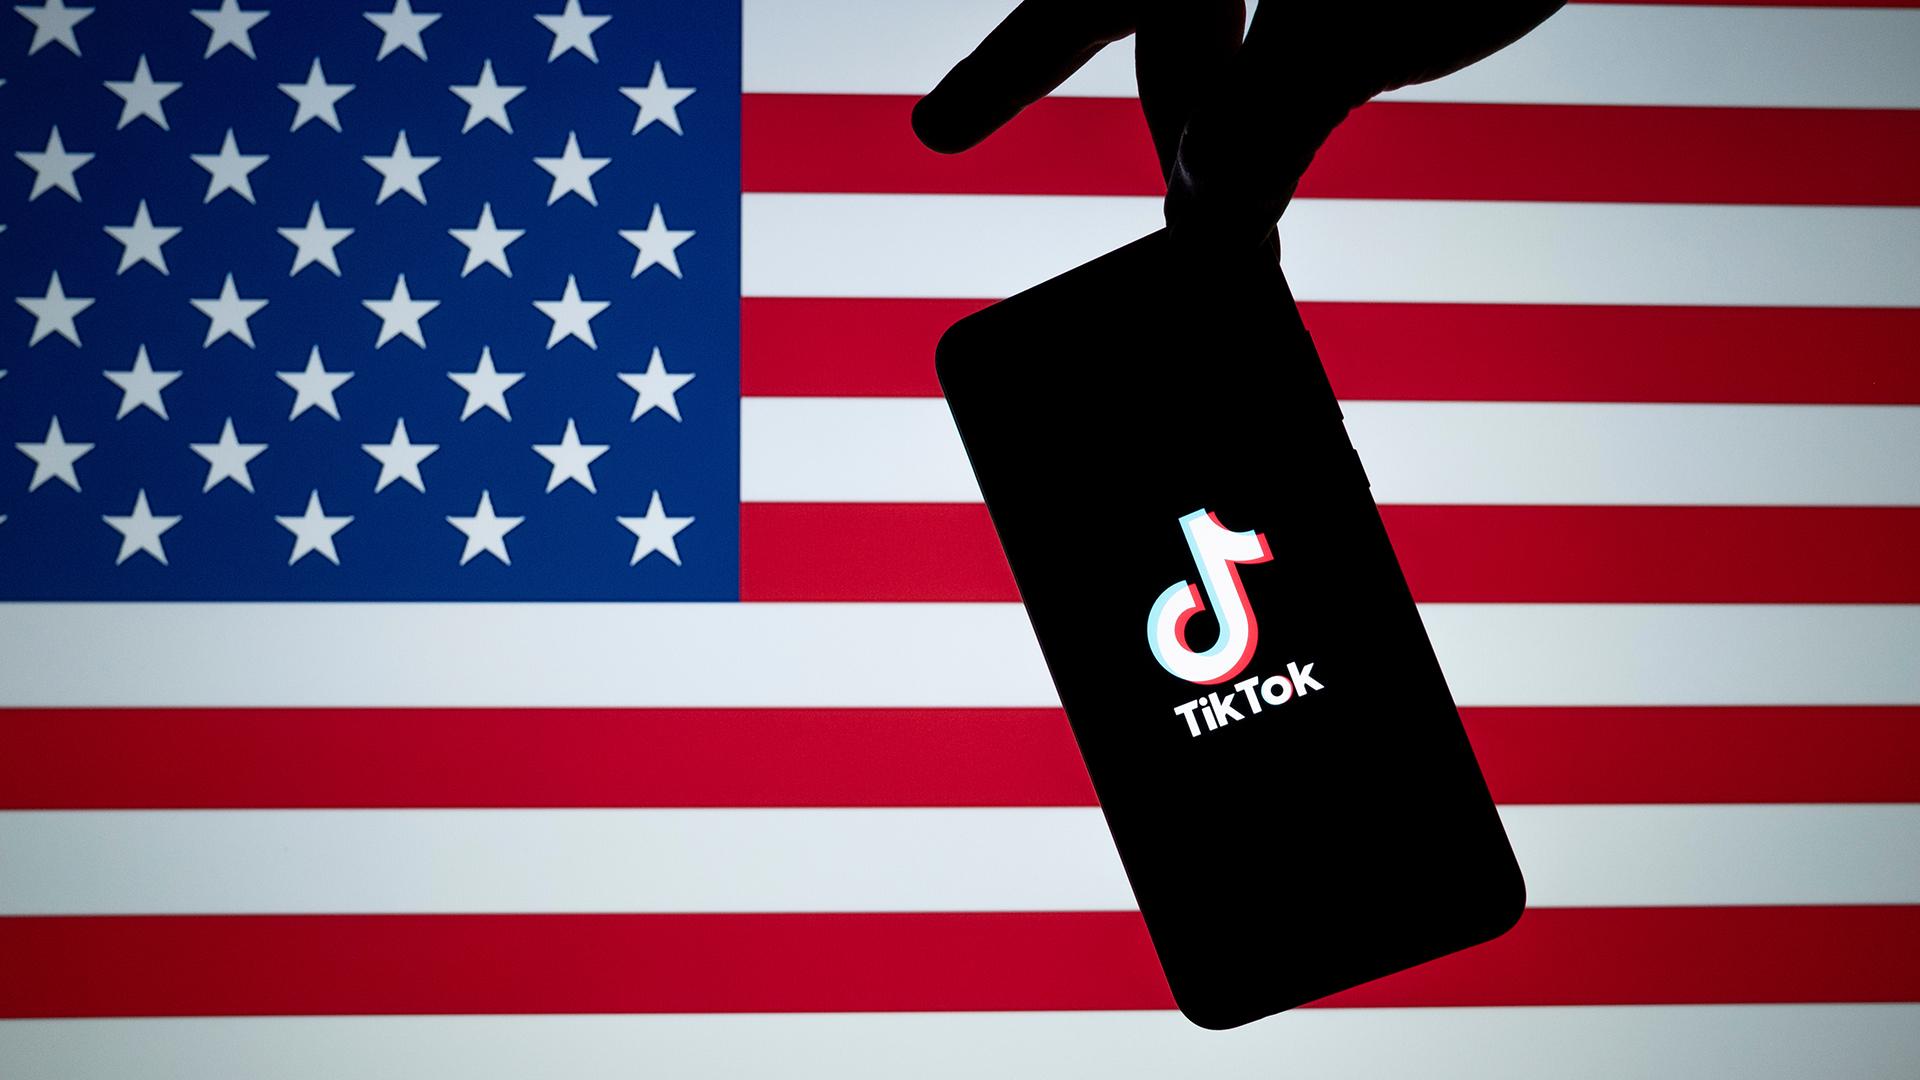 tiktok su bandiera americana